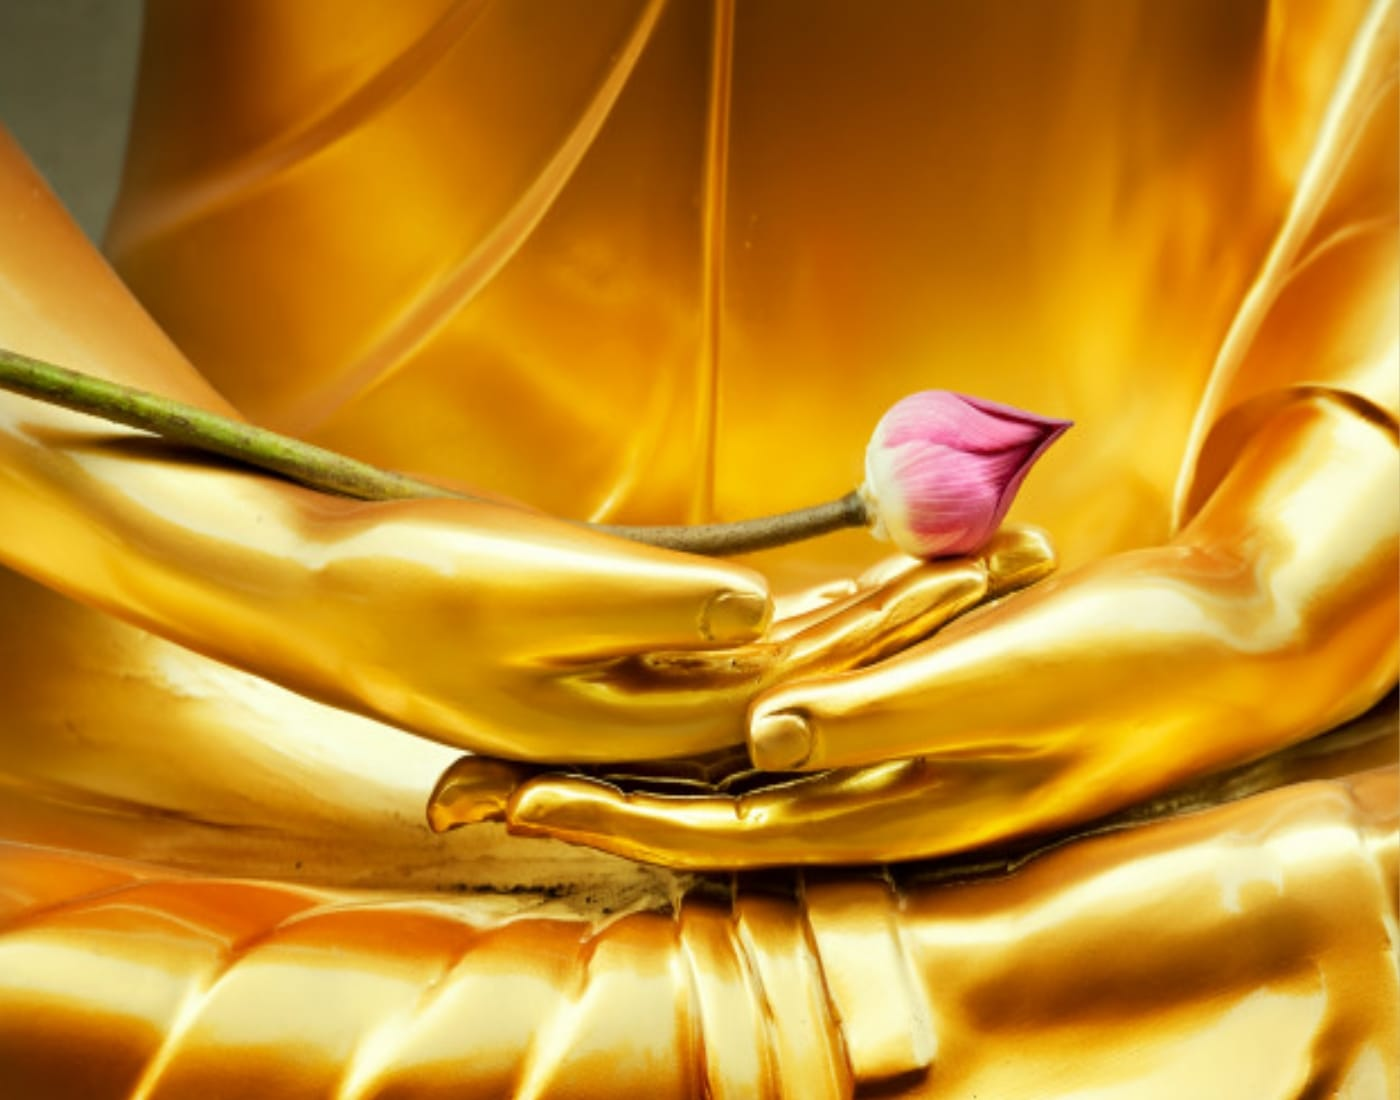 Shamatha and vipassana meditation